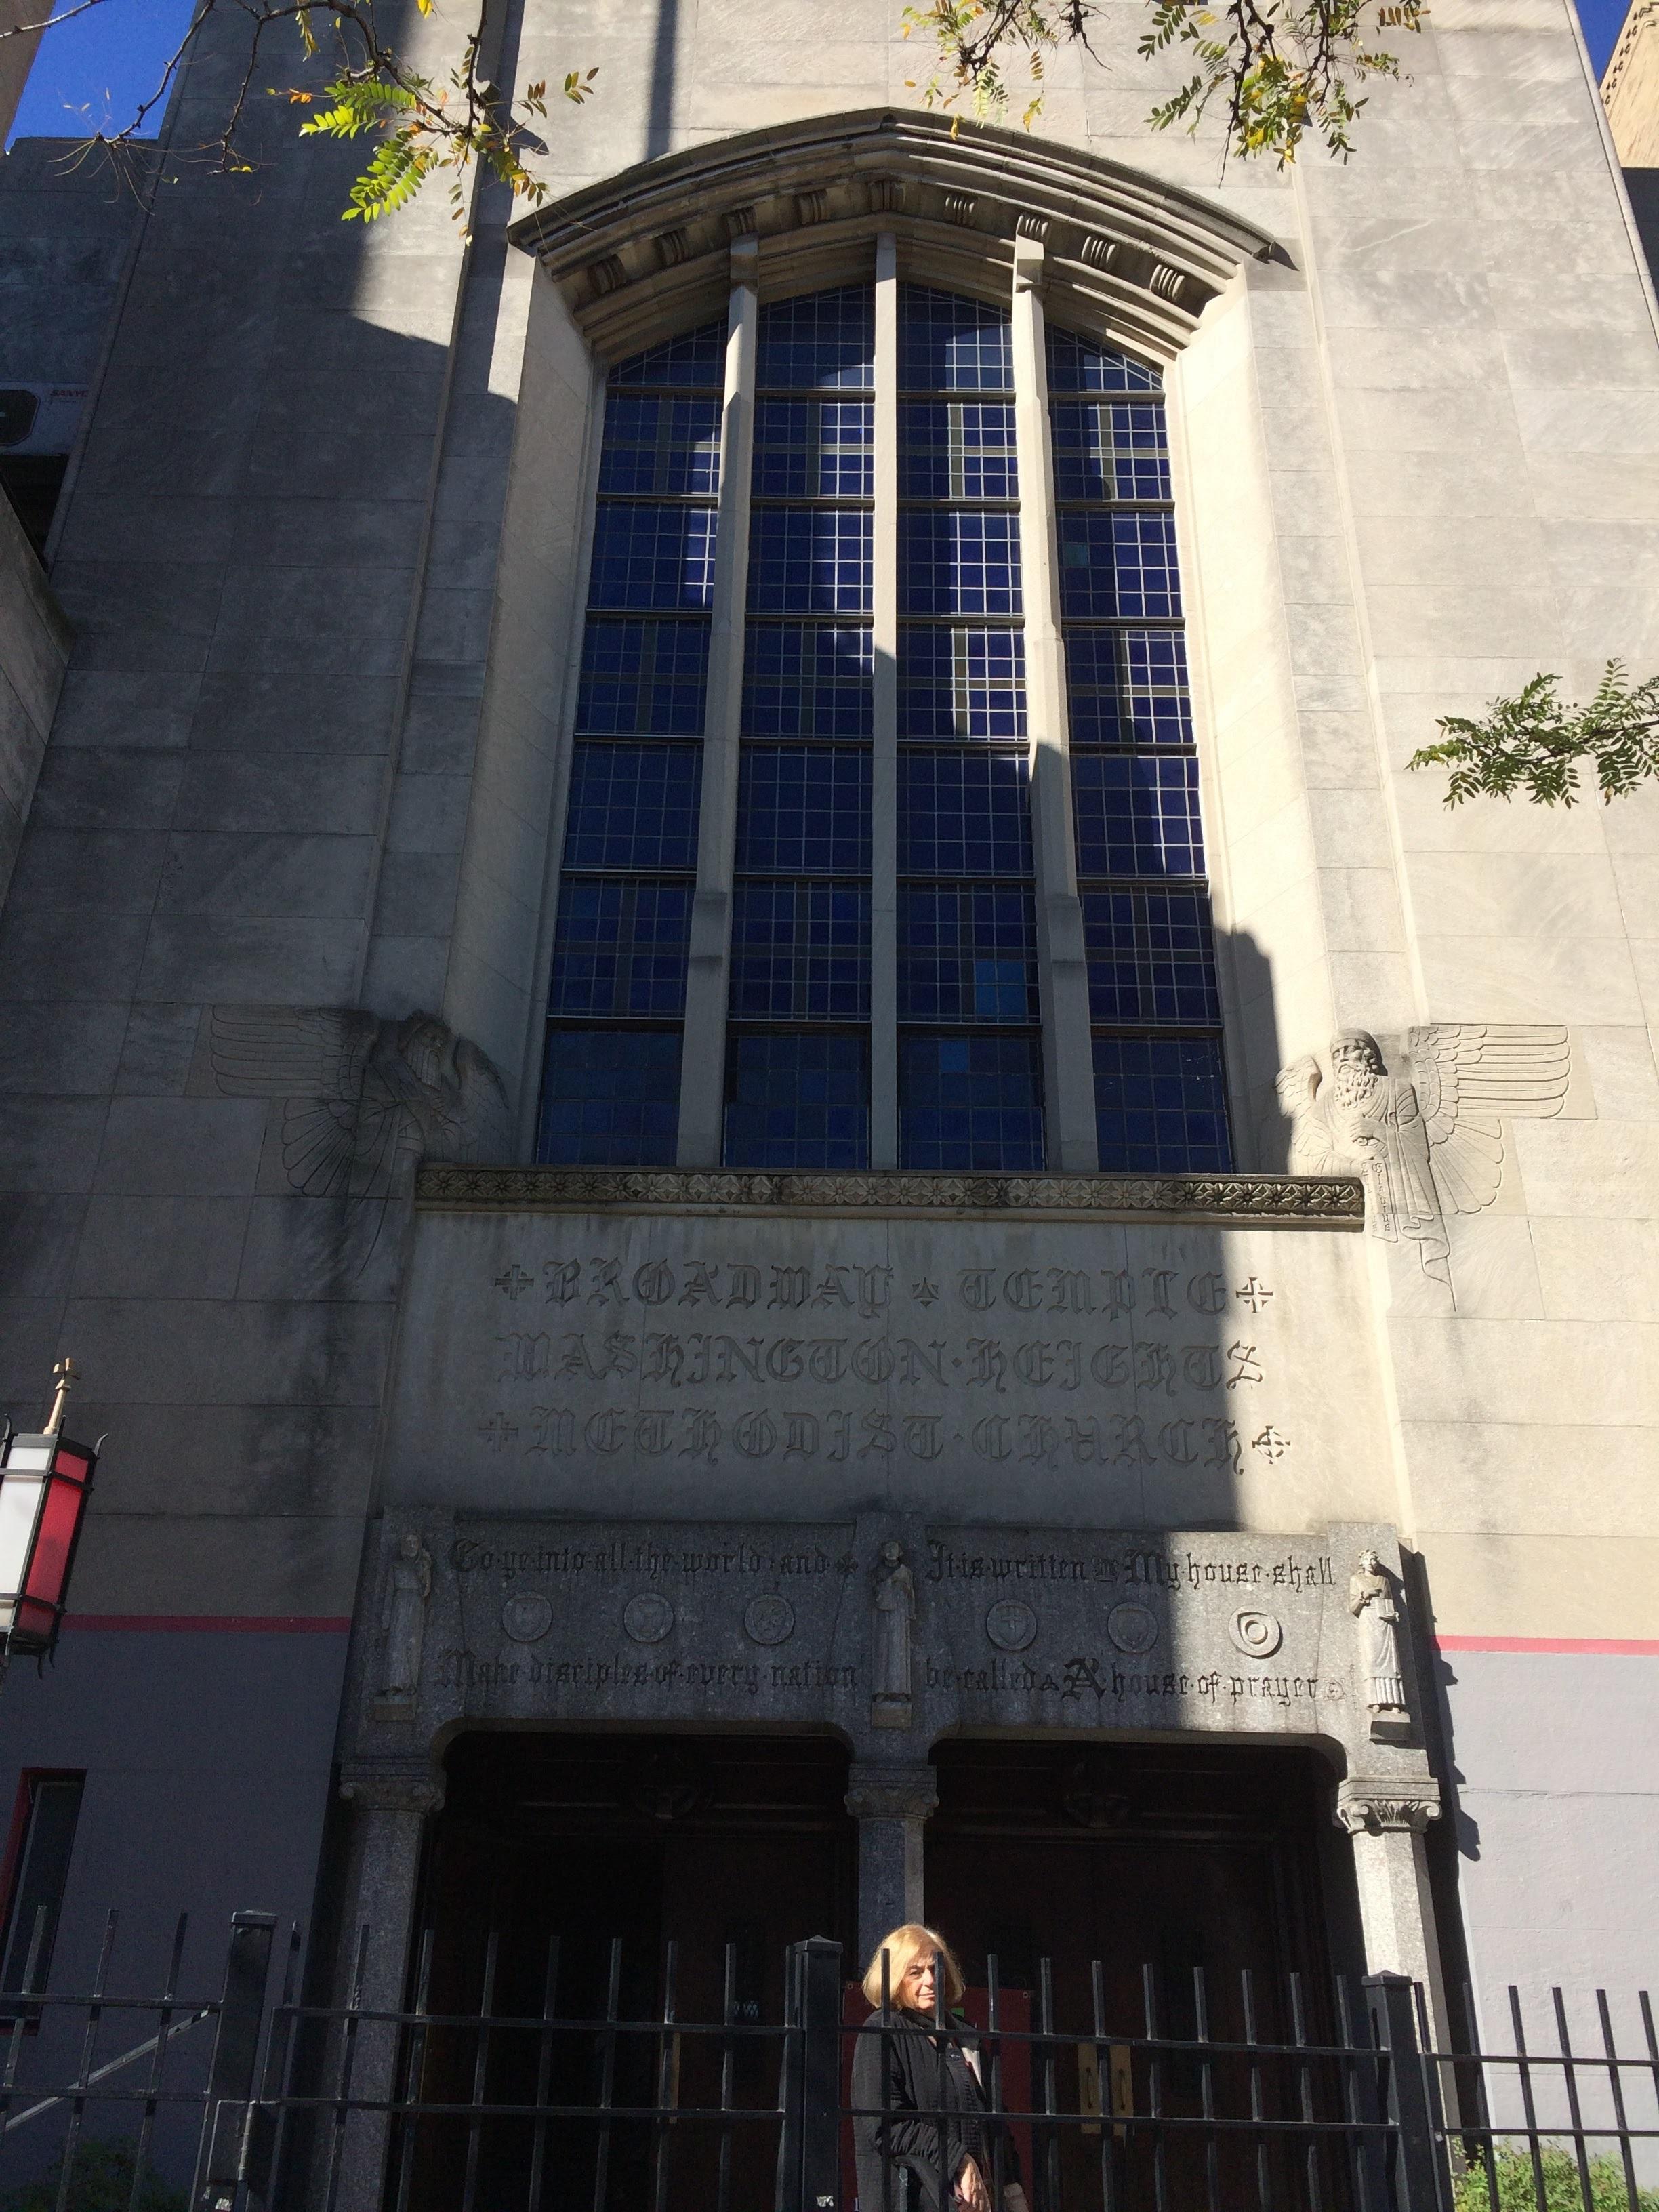 6. Broadway Temple United Methodist Church